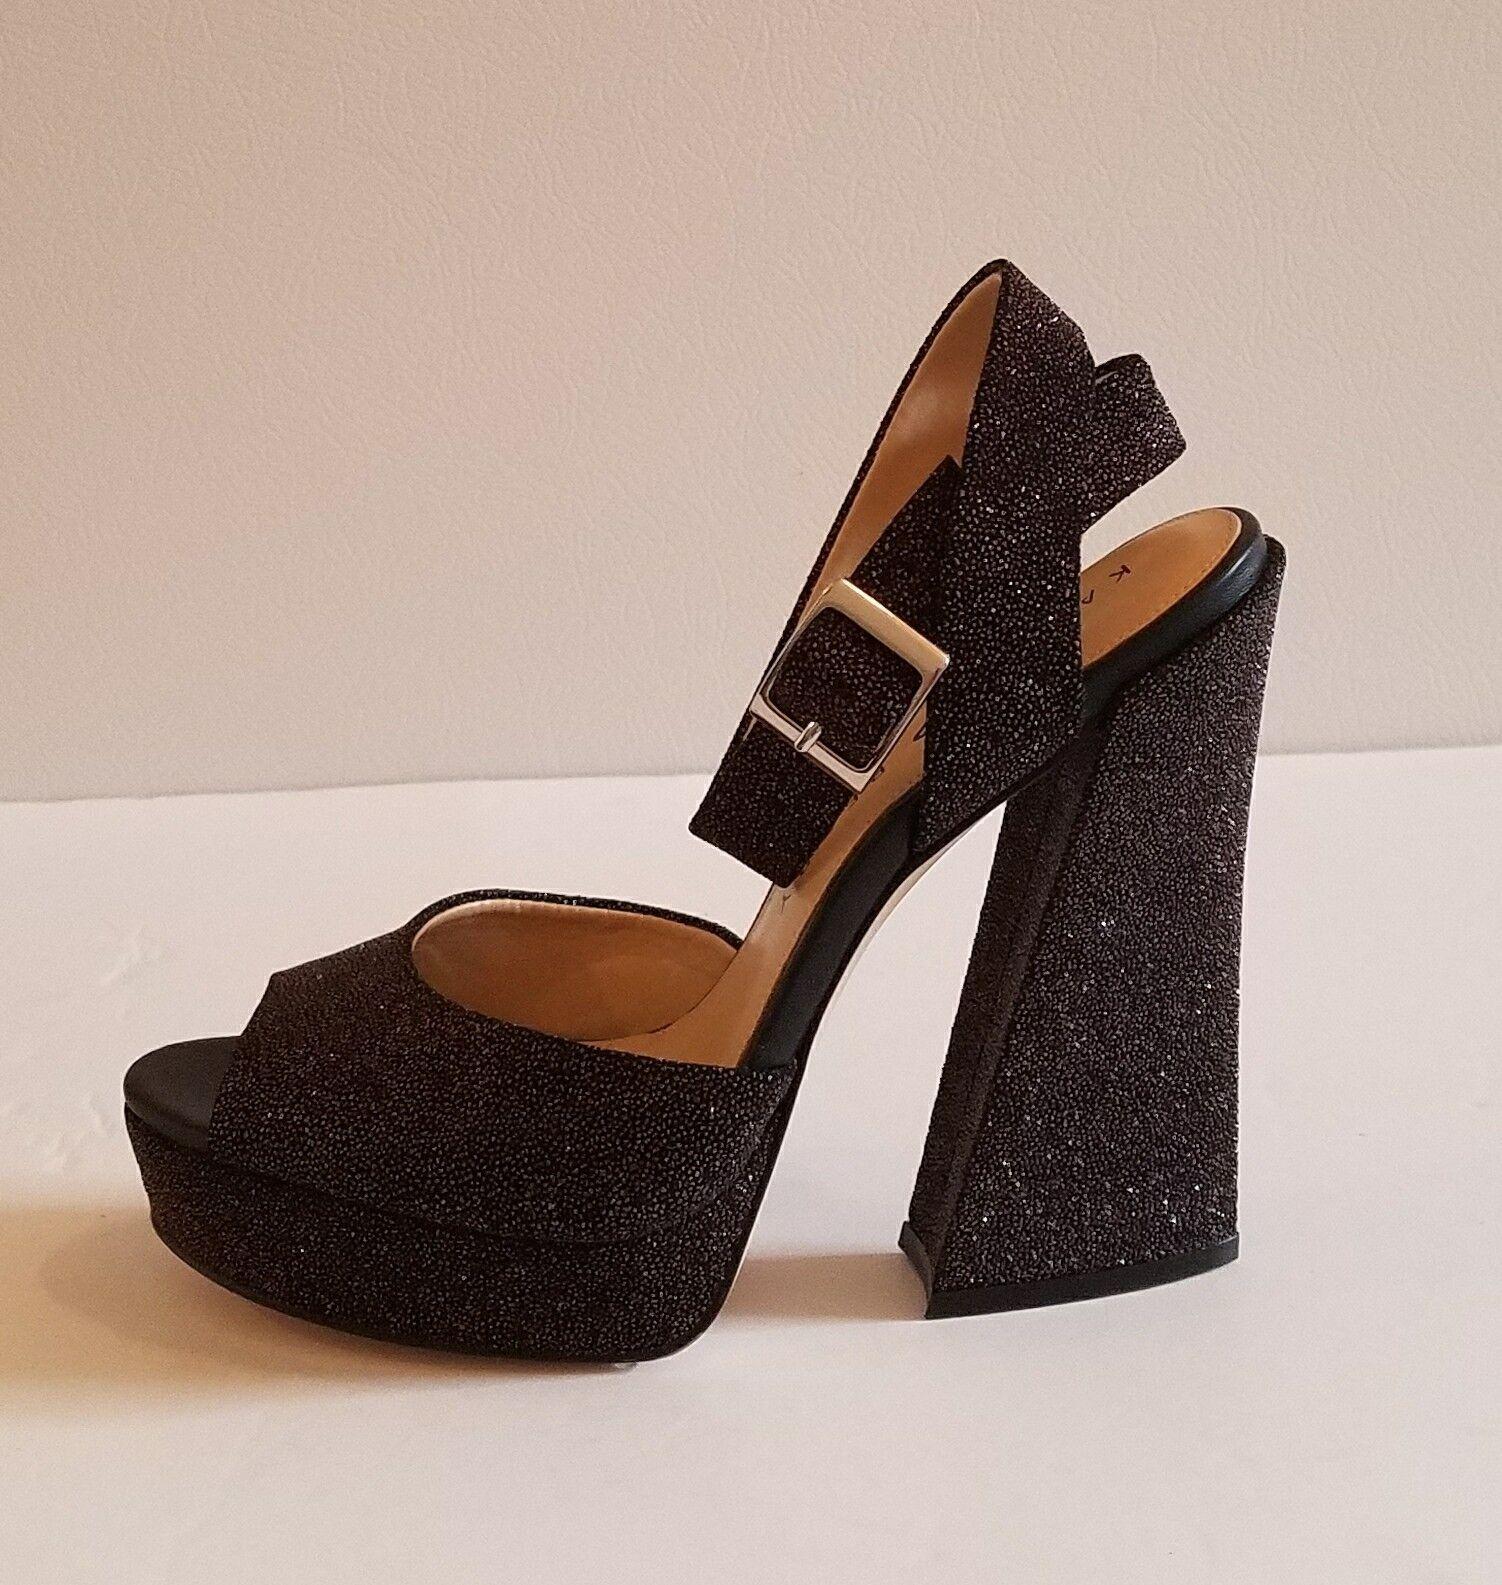 NWOB KATY PERRY Maggie Sparkly  High Heel Sandal Unique Retro 70's Sandal sz 8